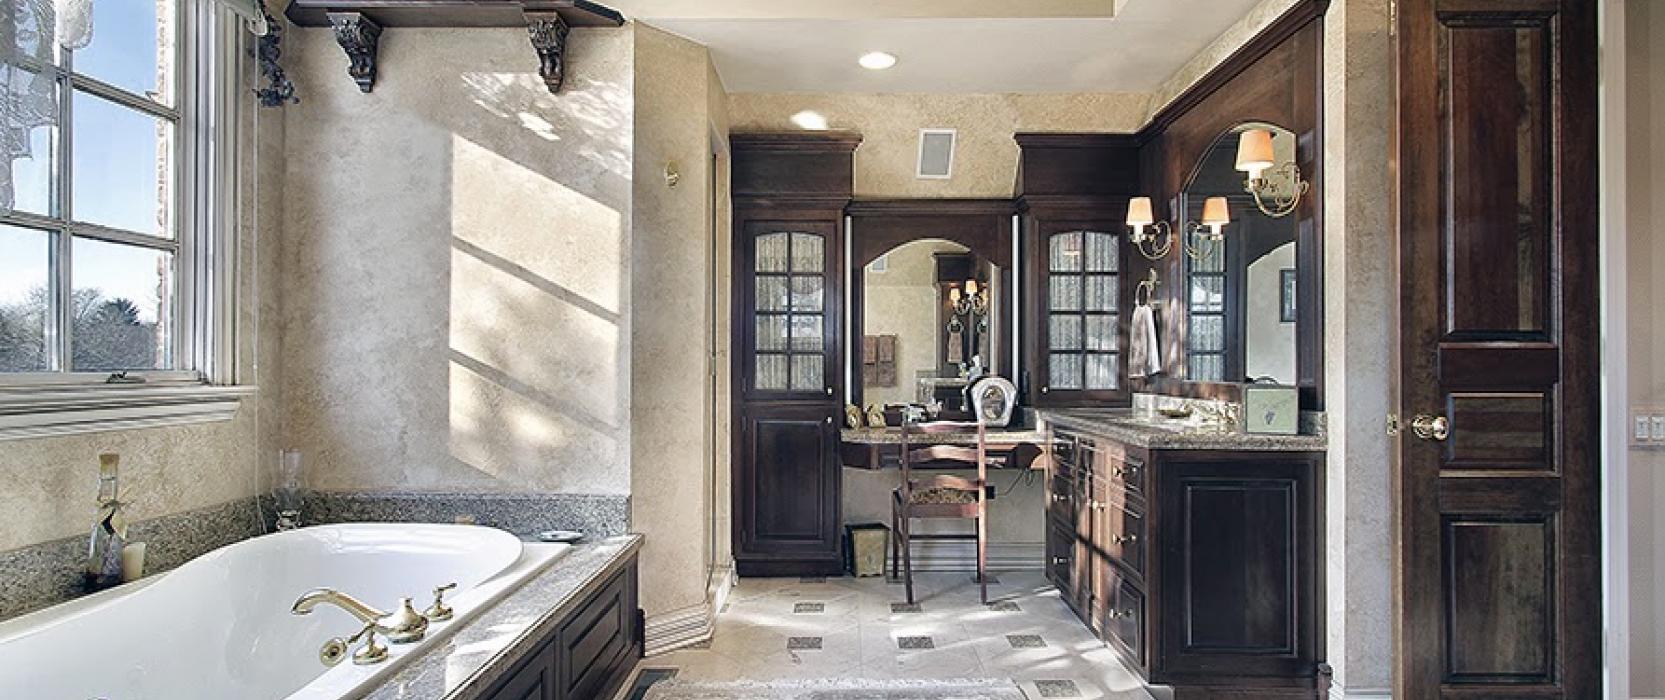 Luxury Bathrooms by Longfellow Design Build